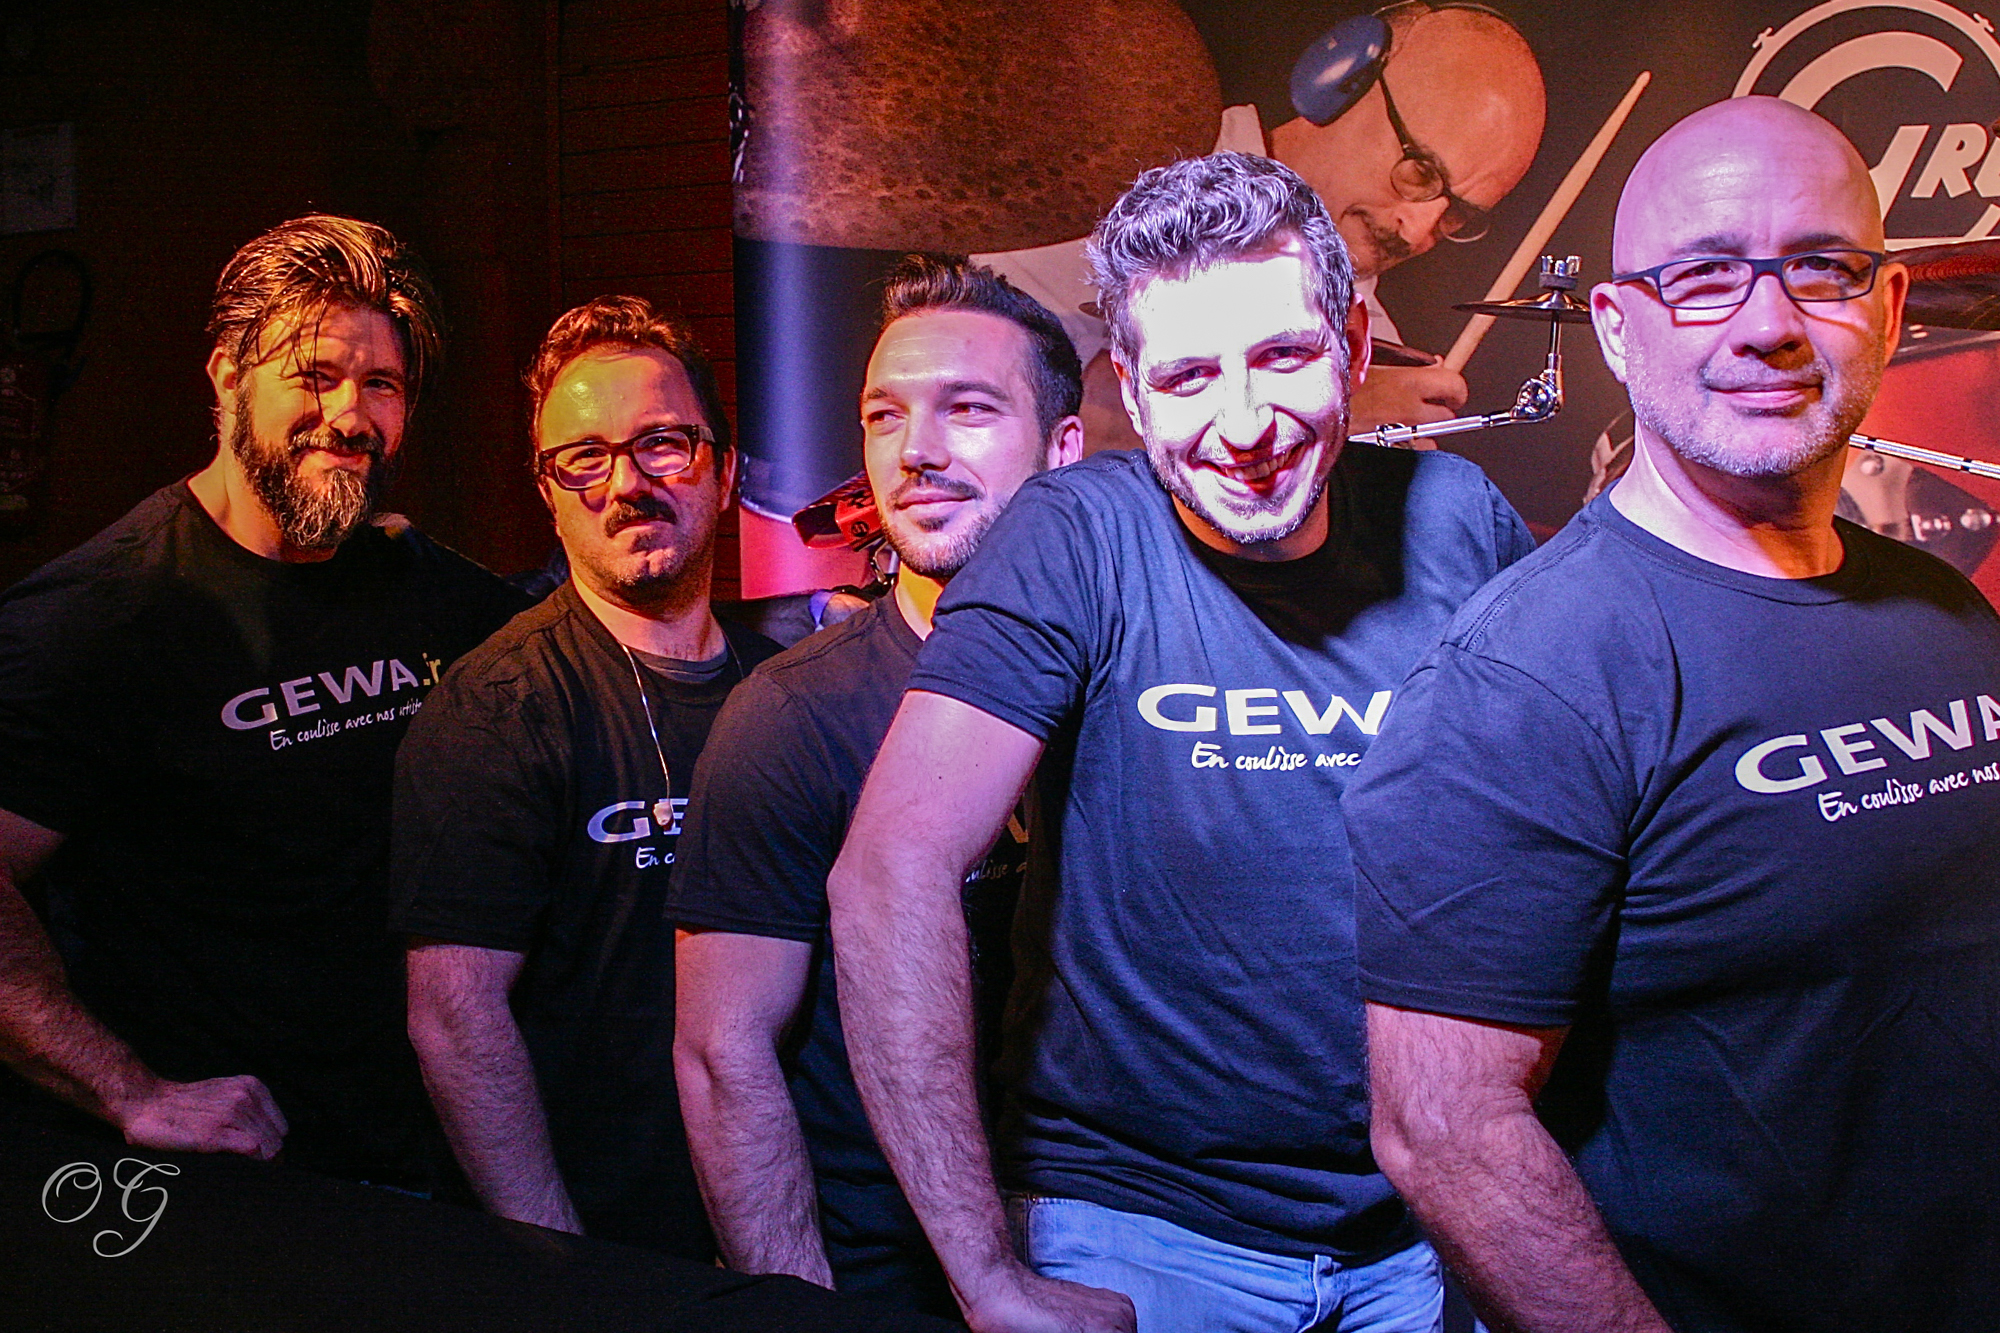 075-BagShow2015-GEWAmusic